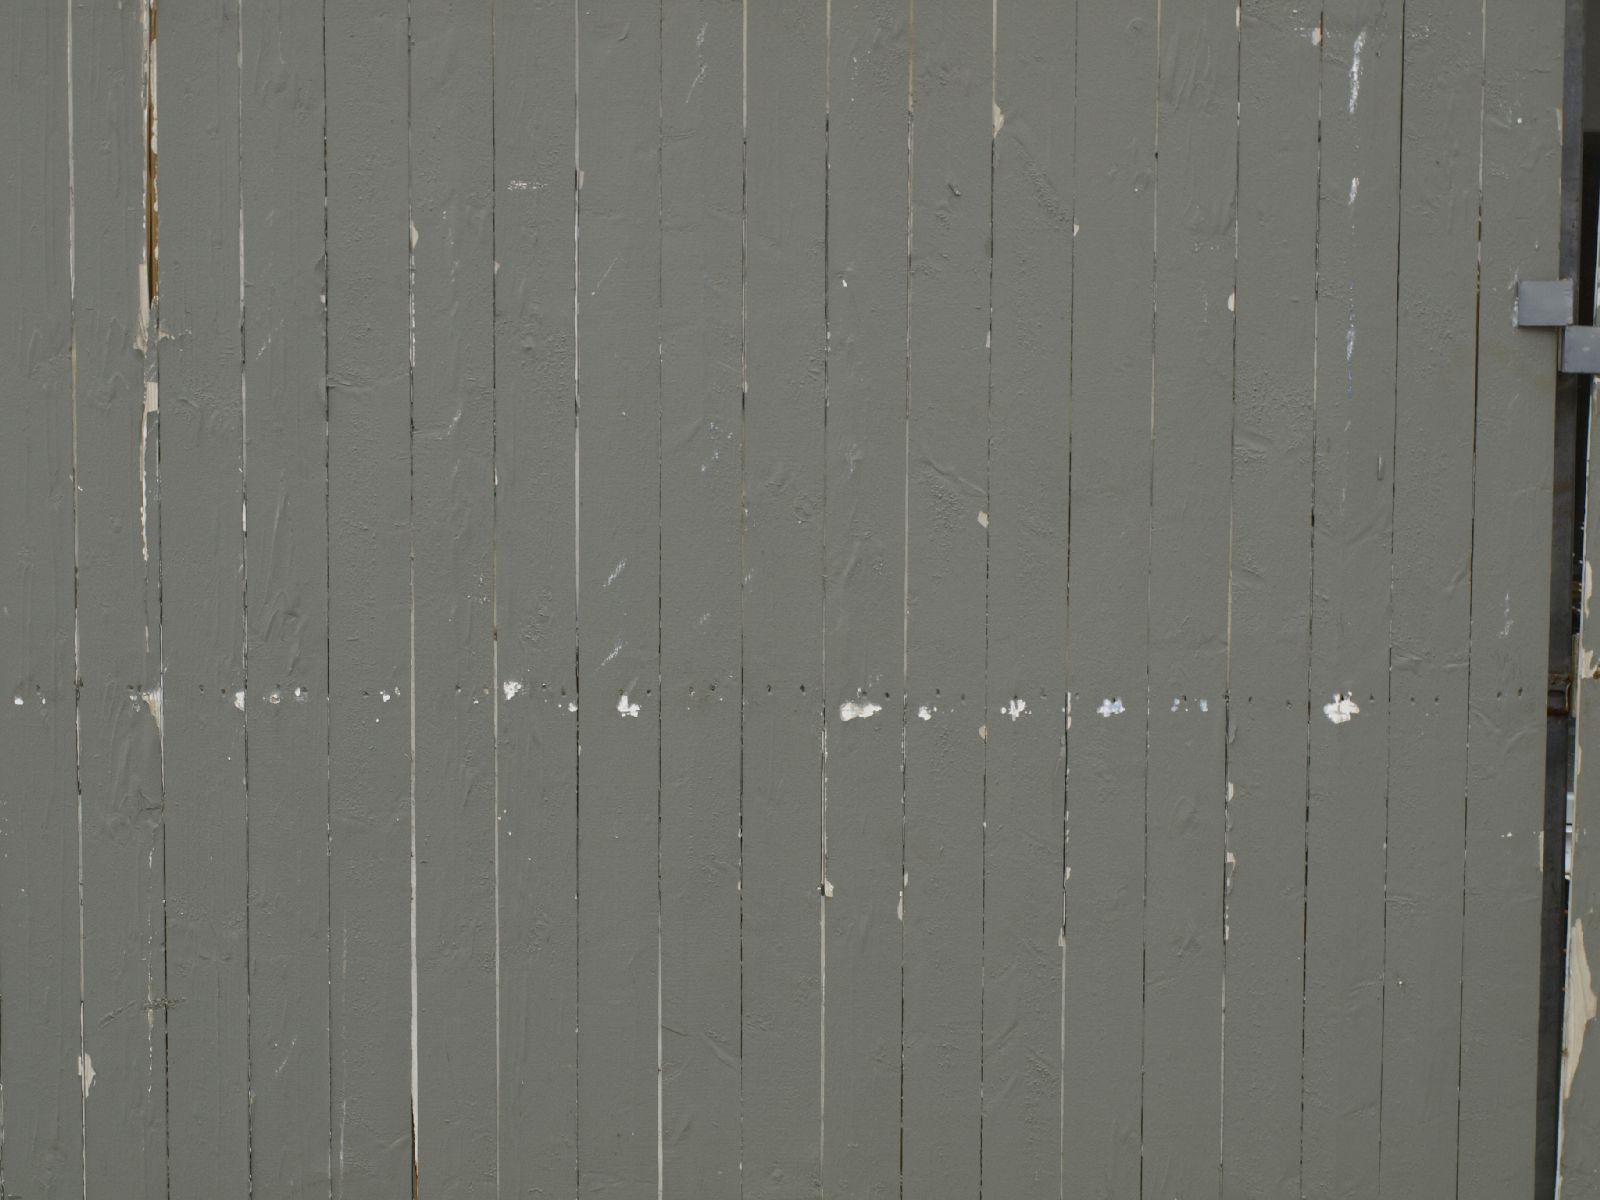 Wood_Texture_A_P5313163